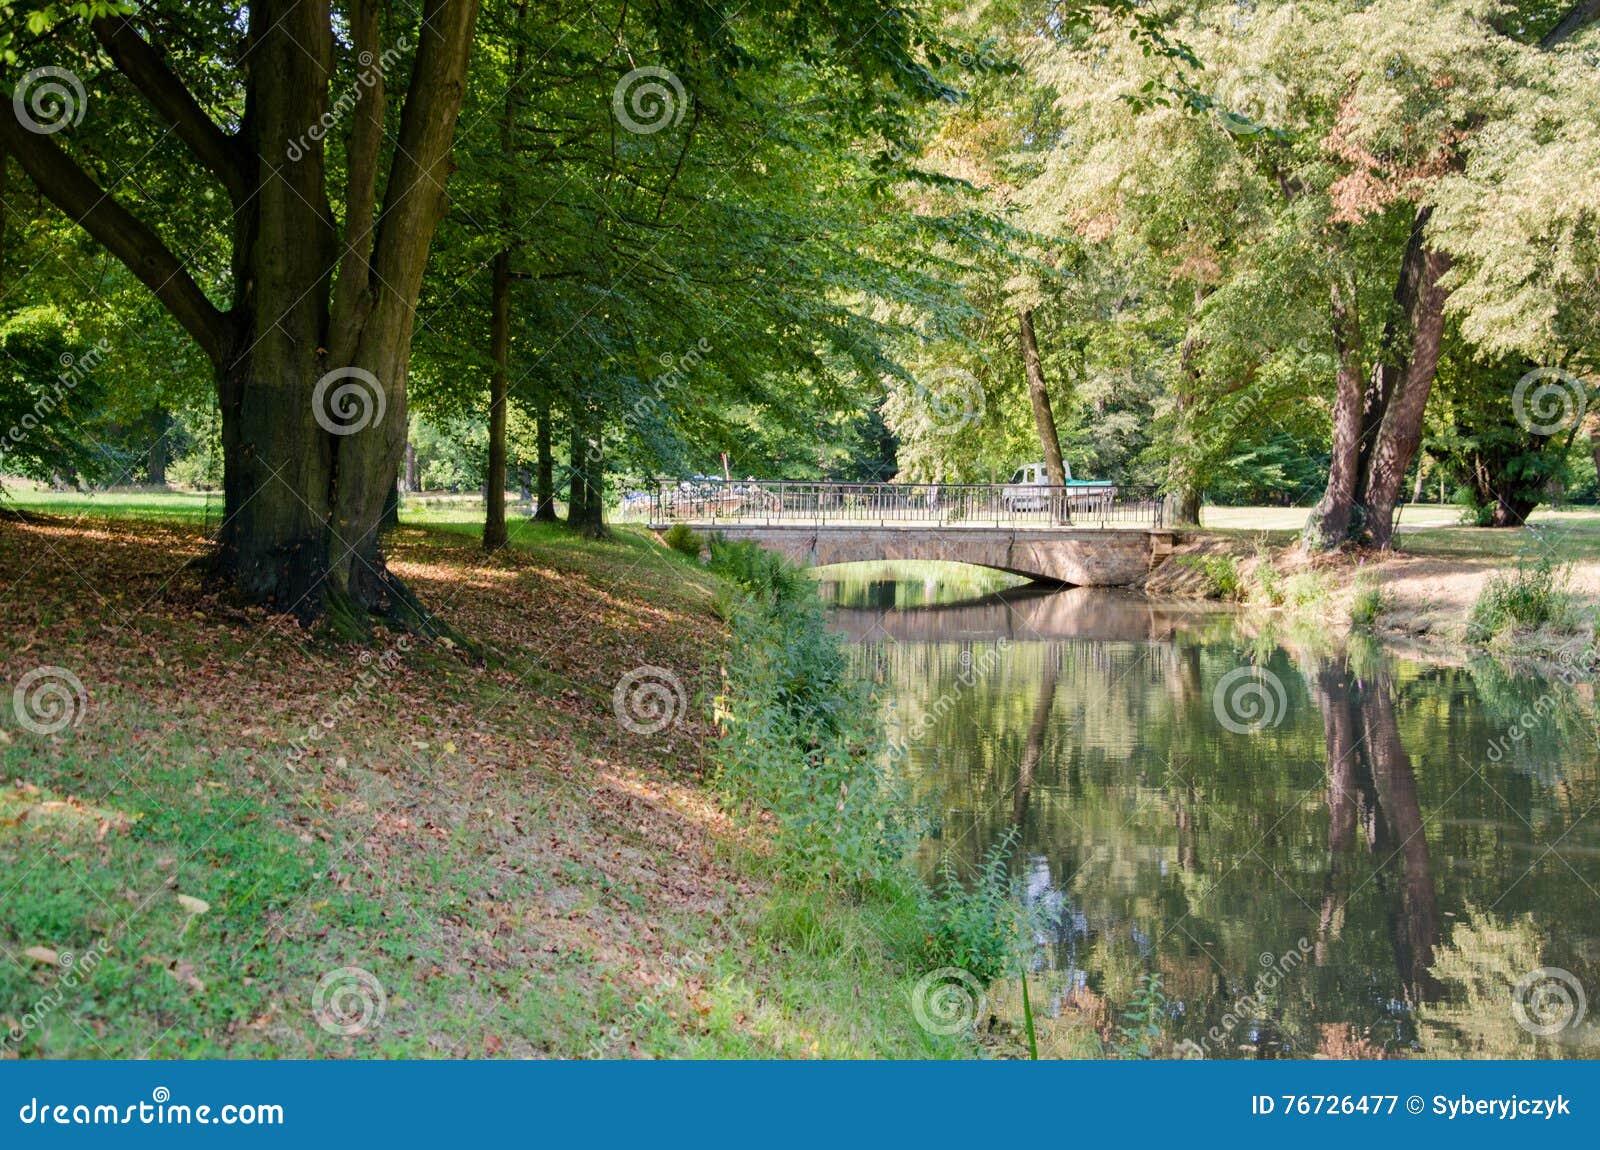 Park von Muskau, Muskauer Park lub Fürst-Pückler-Park, Park Mużakowski